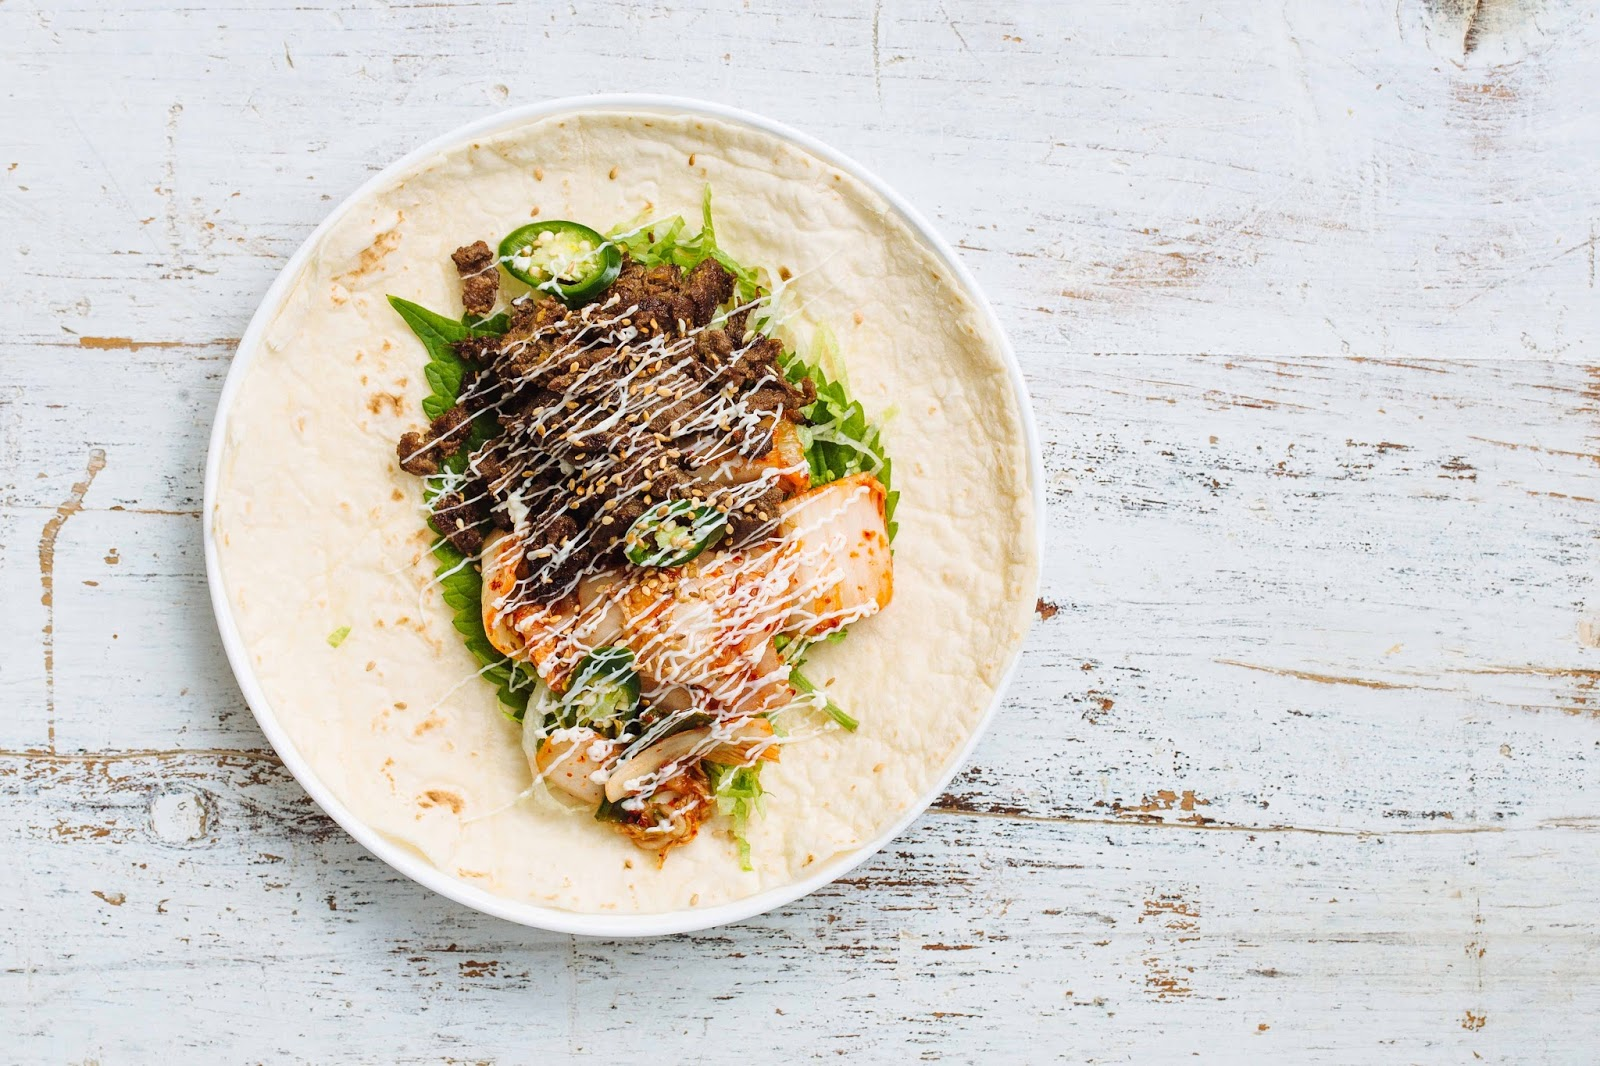 Recipe: Beef Bulgogi and Kimchi Wrap